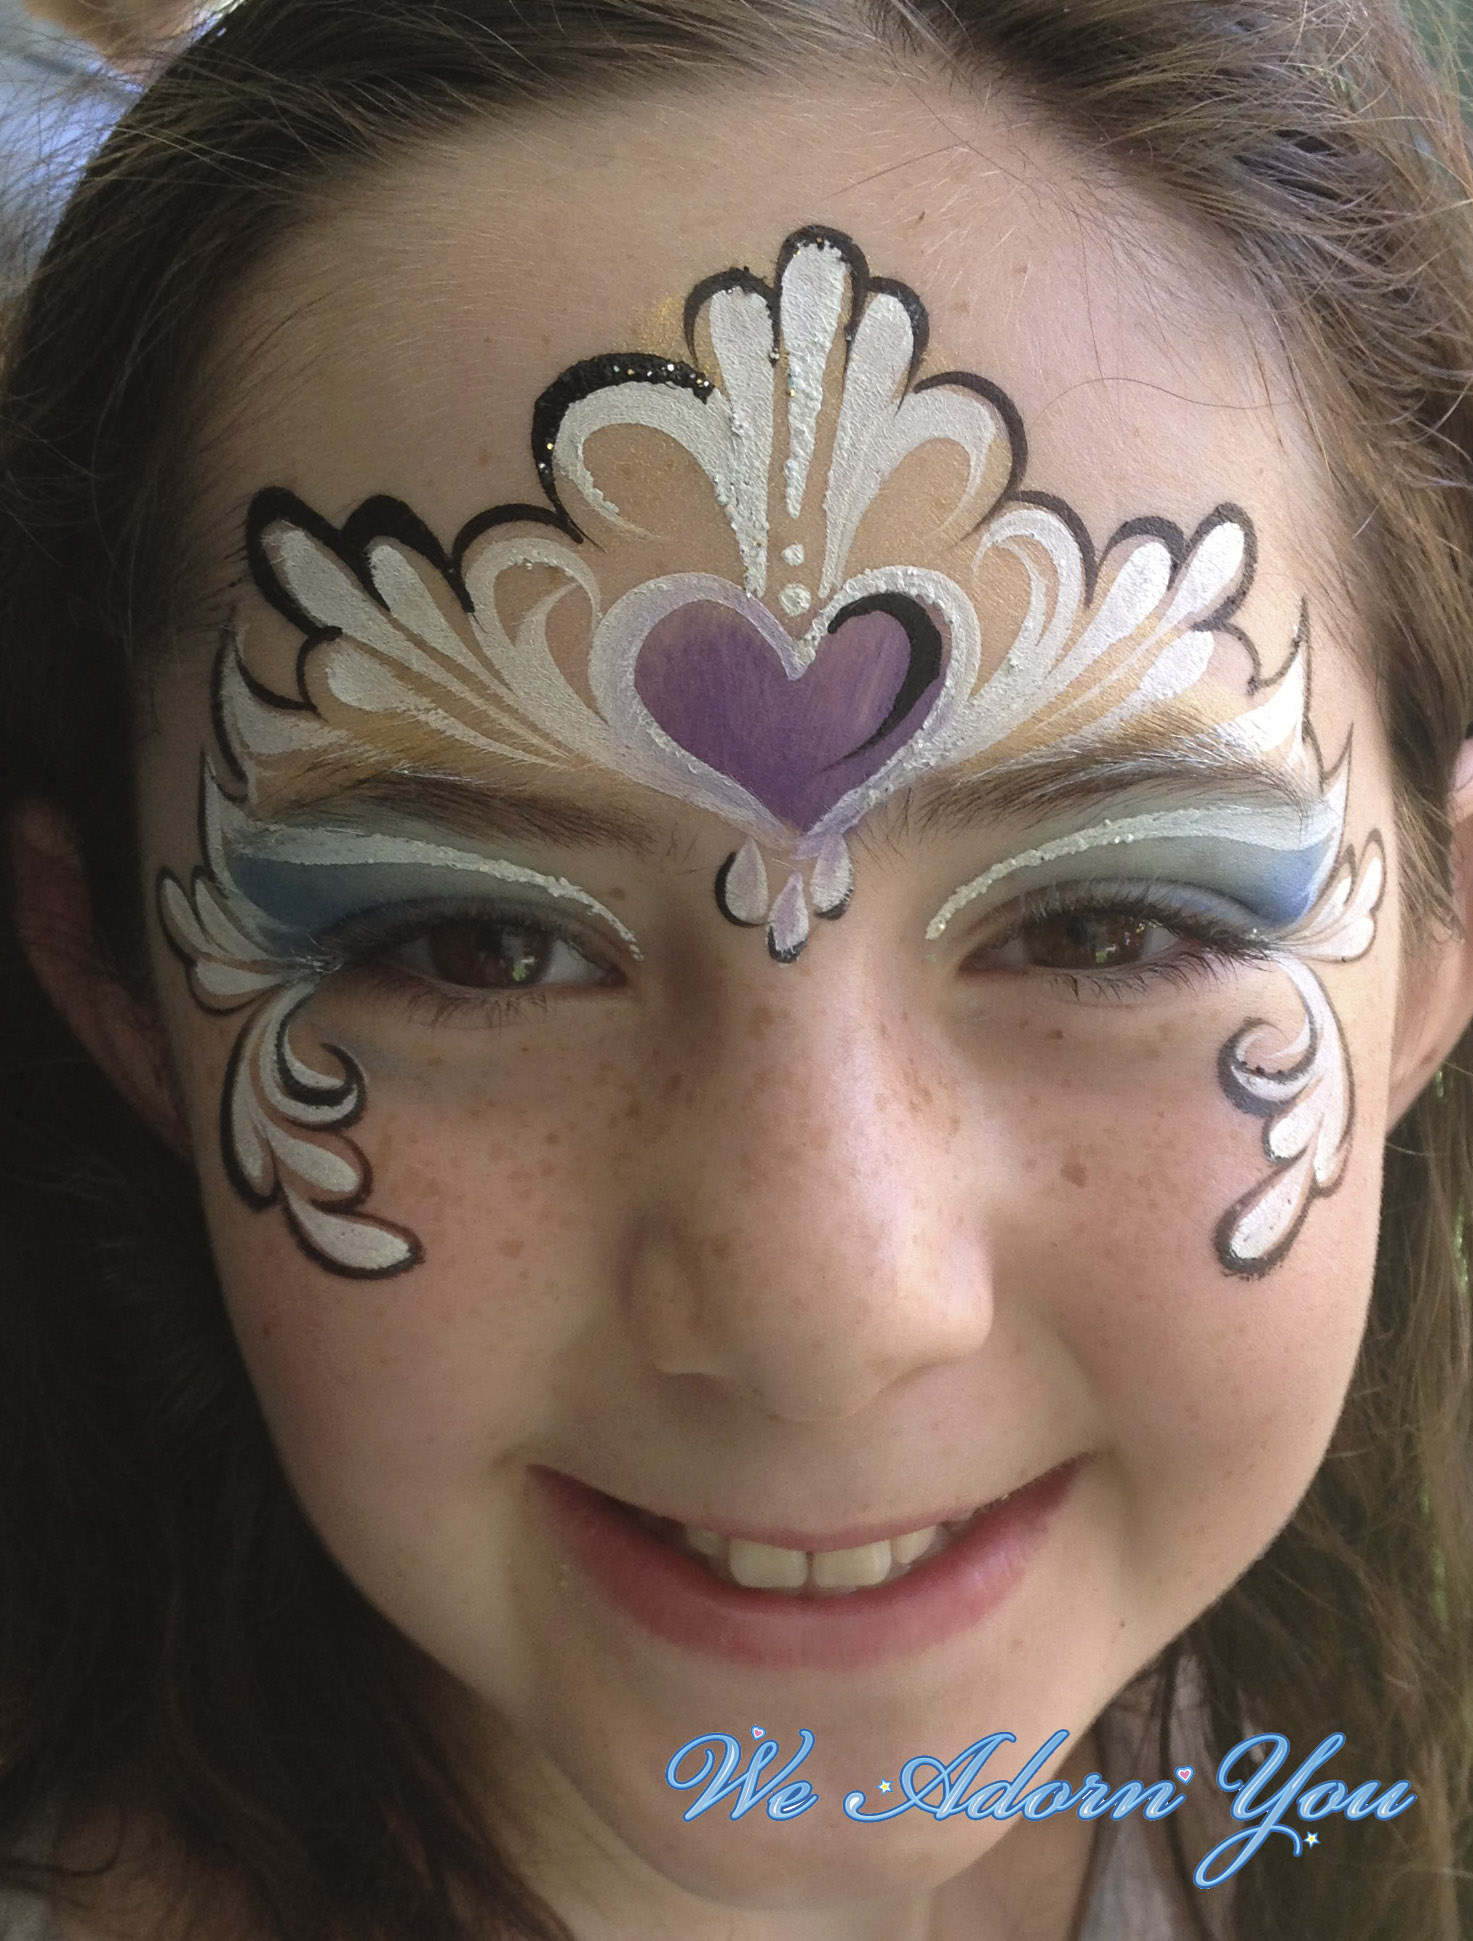 Face Painting Heart Princess - We Adorn You.jpg